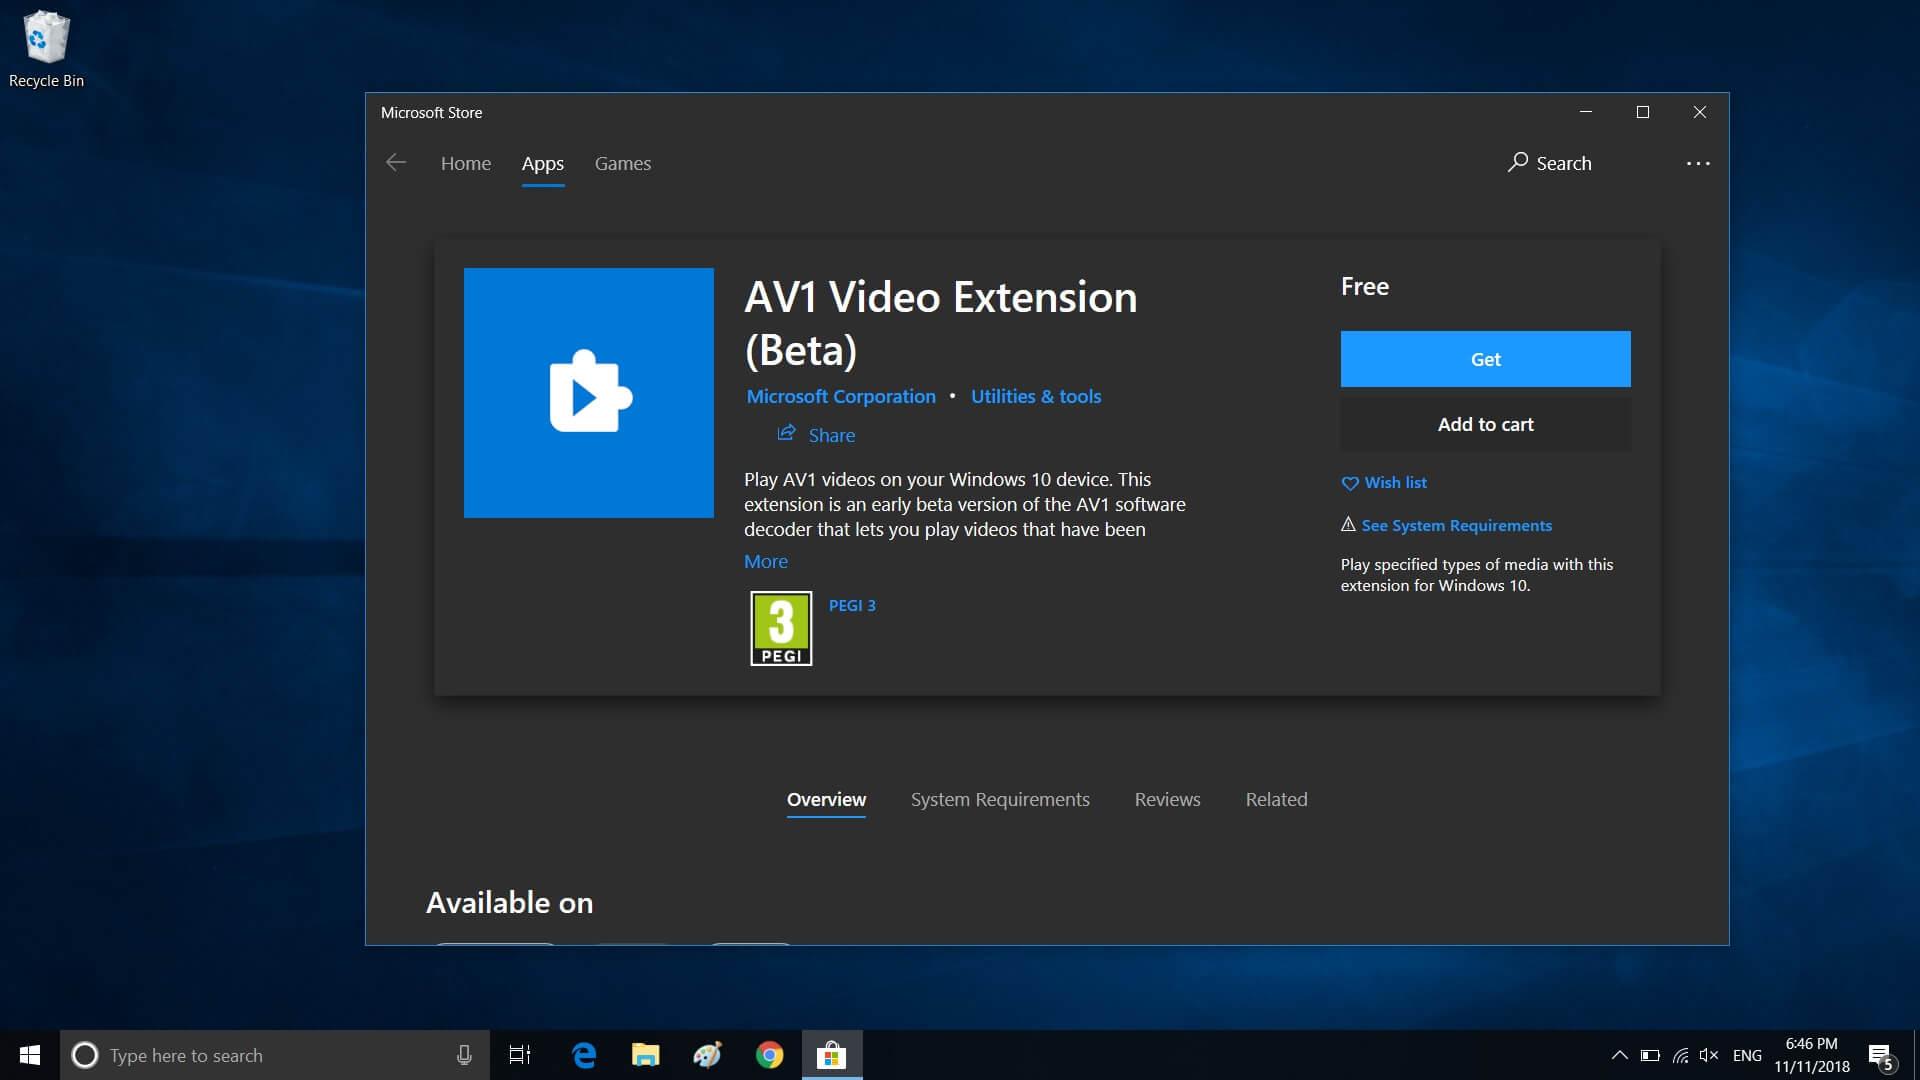 Microsoft brings AV1 Video Codec support to Windows 10